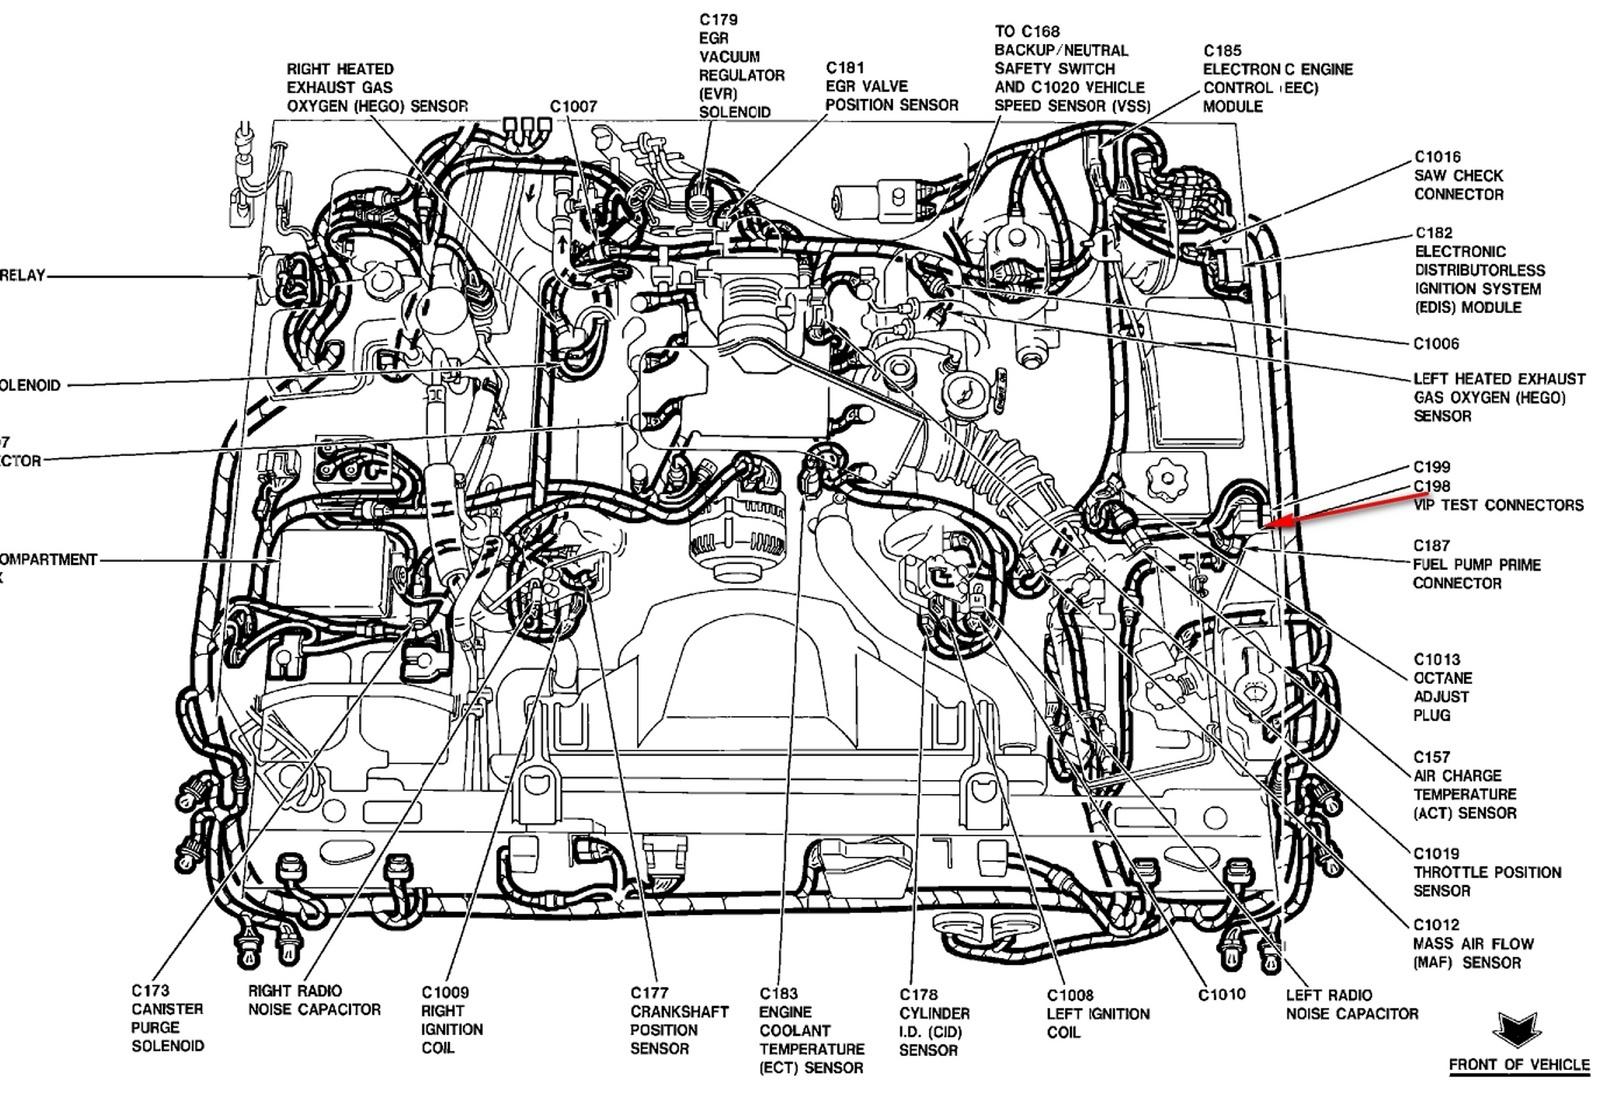 Admirable Buick 3100 Engine Diagram Wiring Diagram Wiring Cloud Icalpermsplehendilmohammedshrineorg